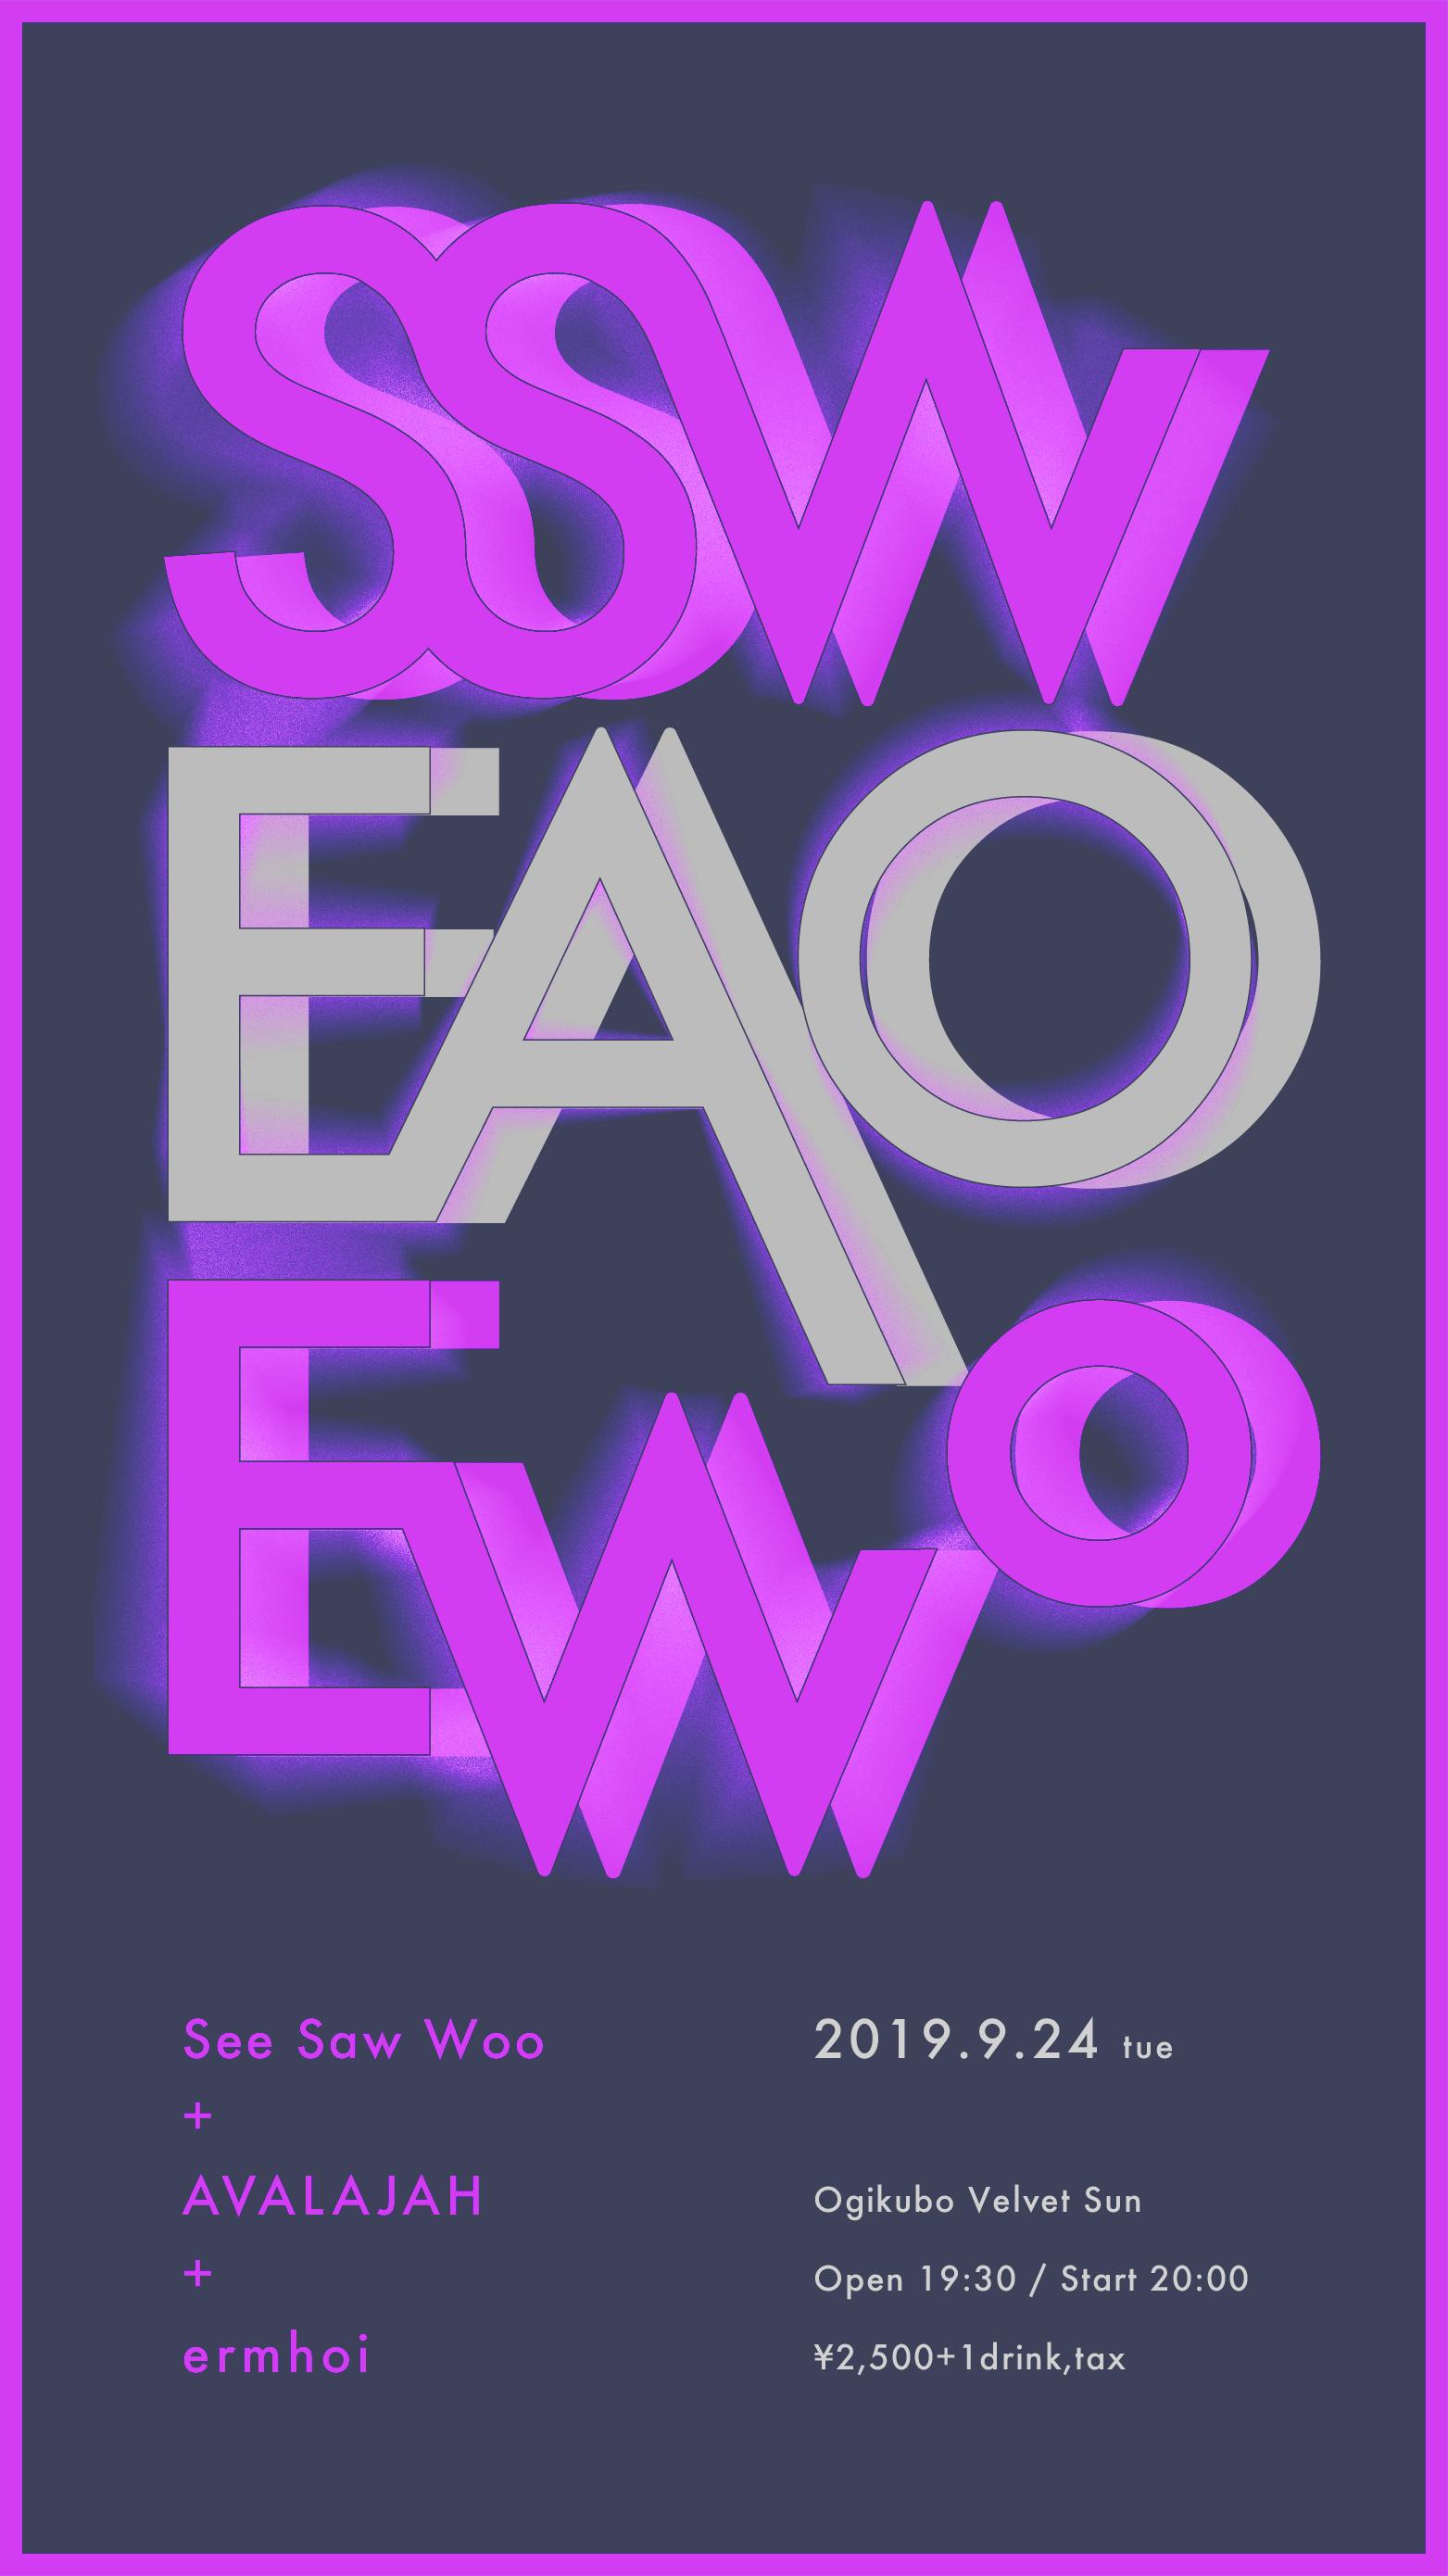 seesawwoo1-01m.png